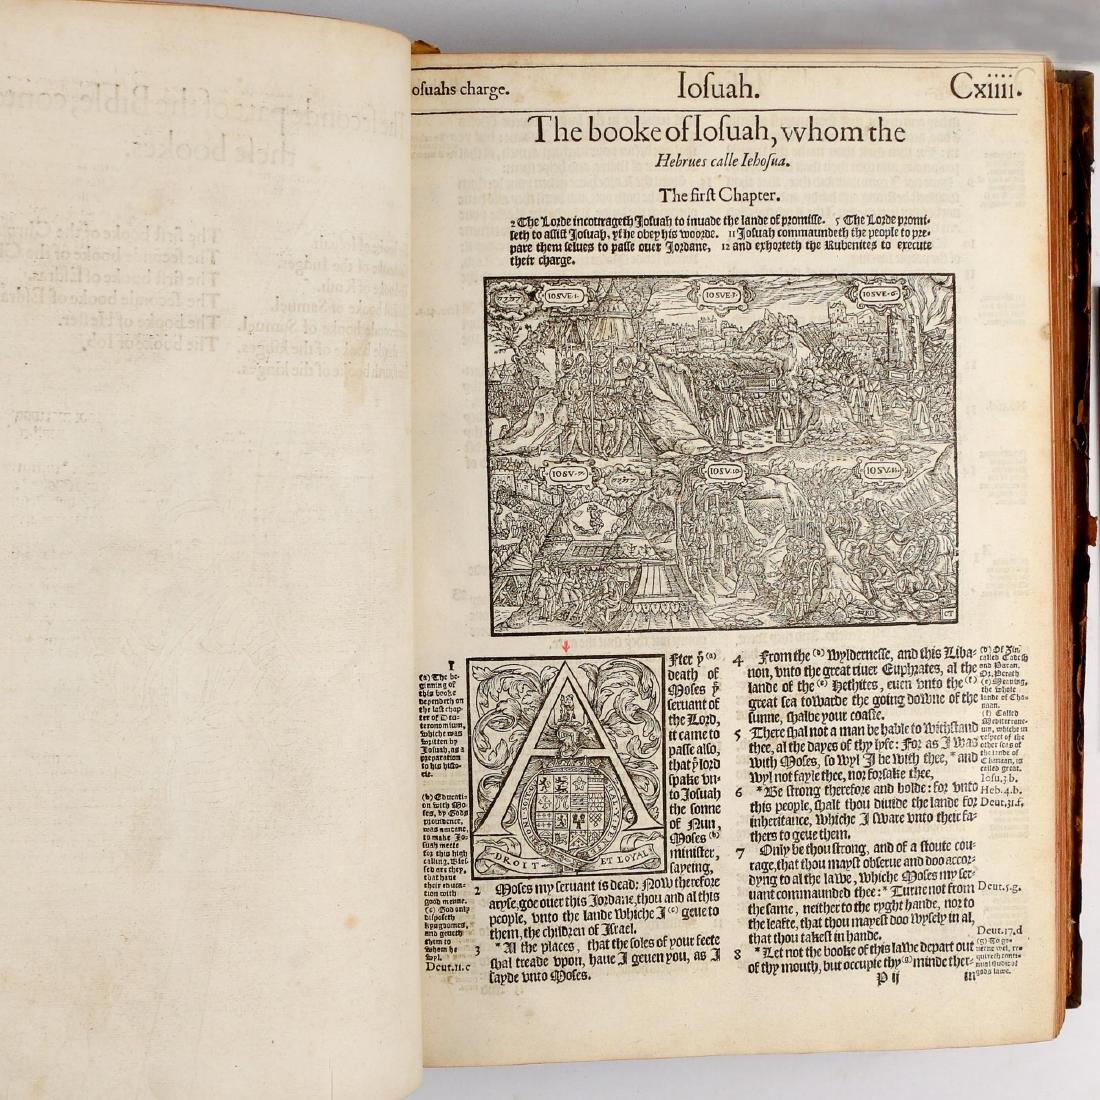 [FRANCIS FRY COPY] BISHOPS' BIBLE [1572] - 19